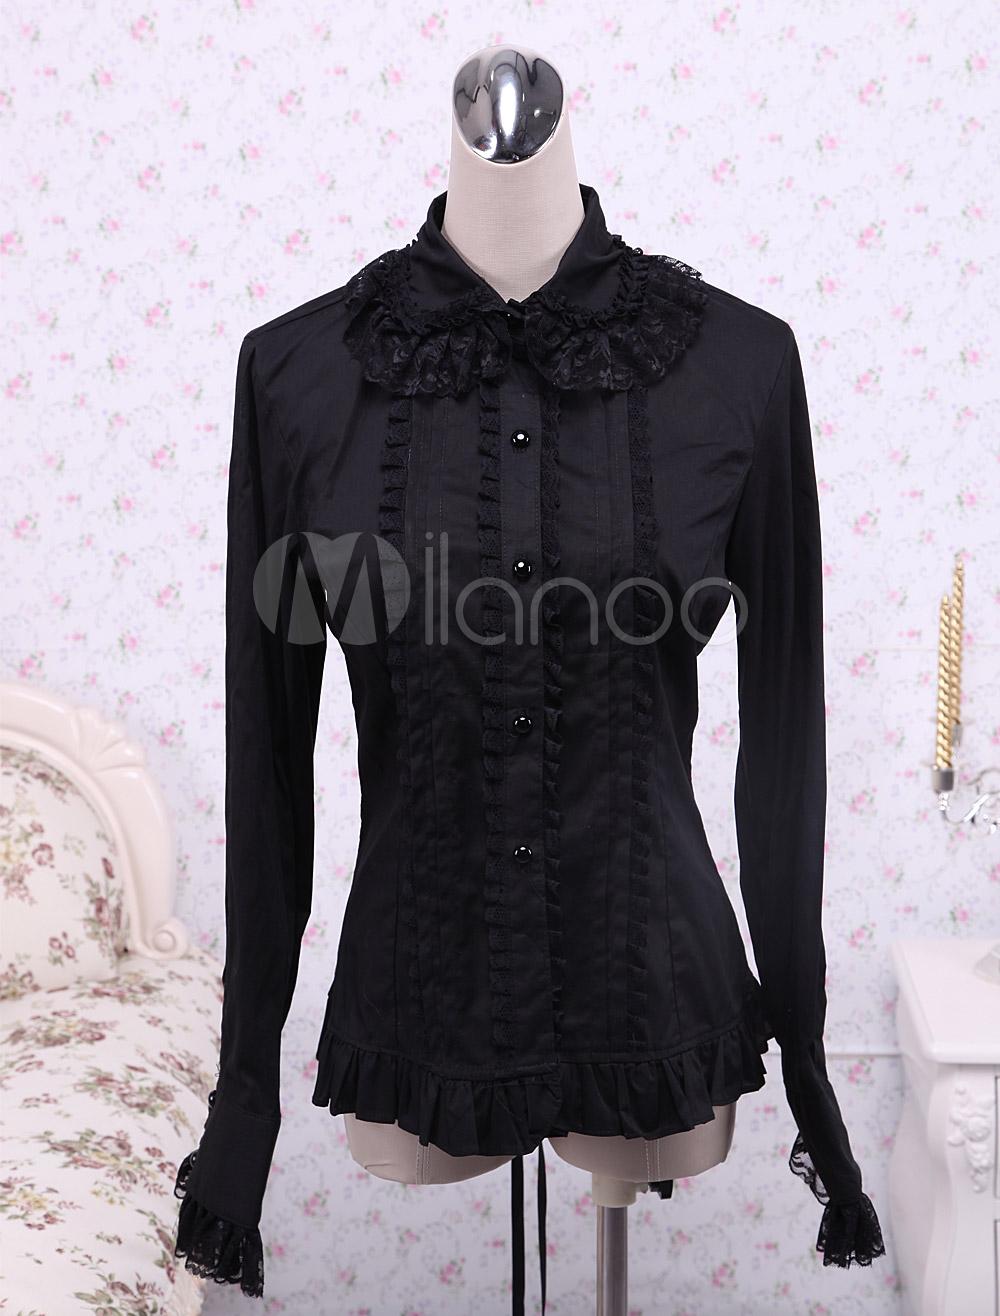 Black Cotton Lolita Blouse Long Sleeves Lace Trim Ruffles